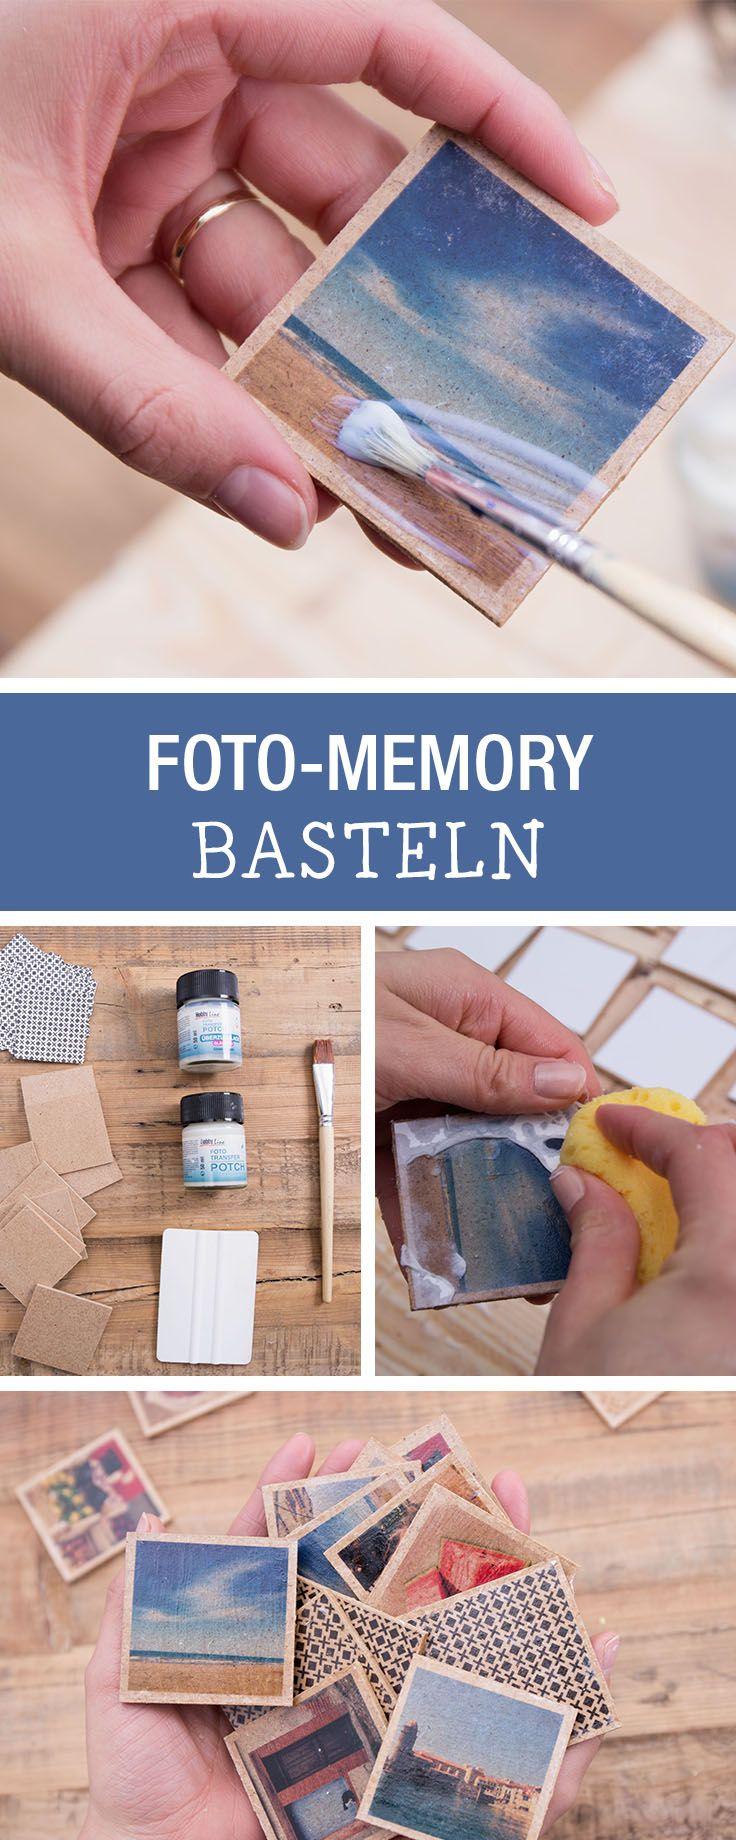 Erinnerungen Aufbewahren diy anleitung individuelles foto memory basteln via dawanda com